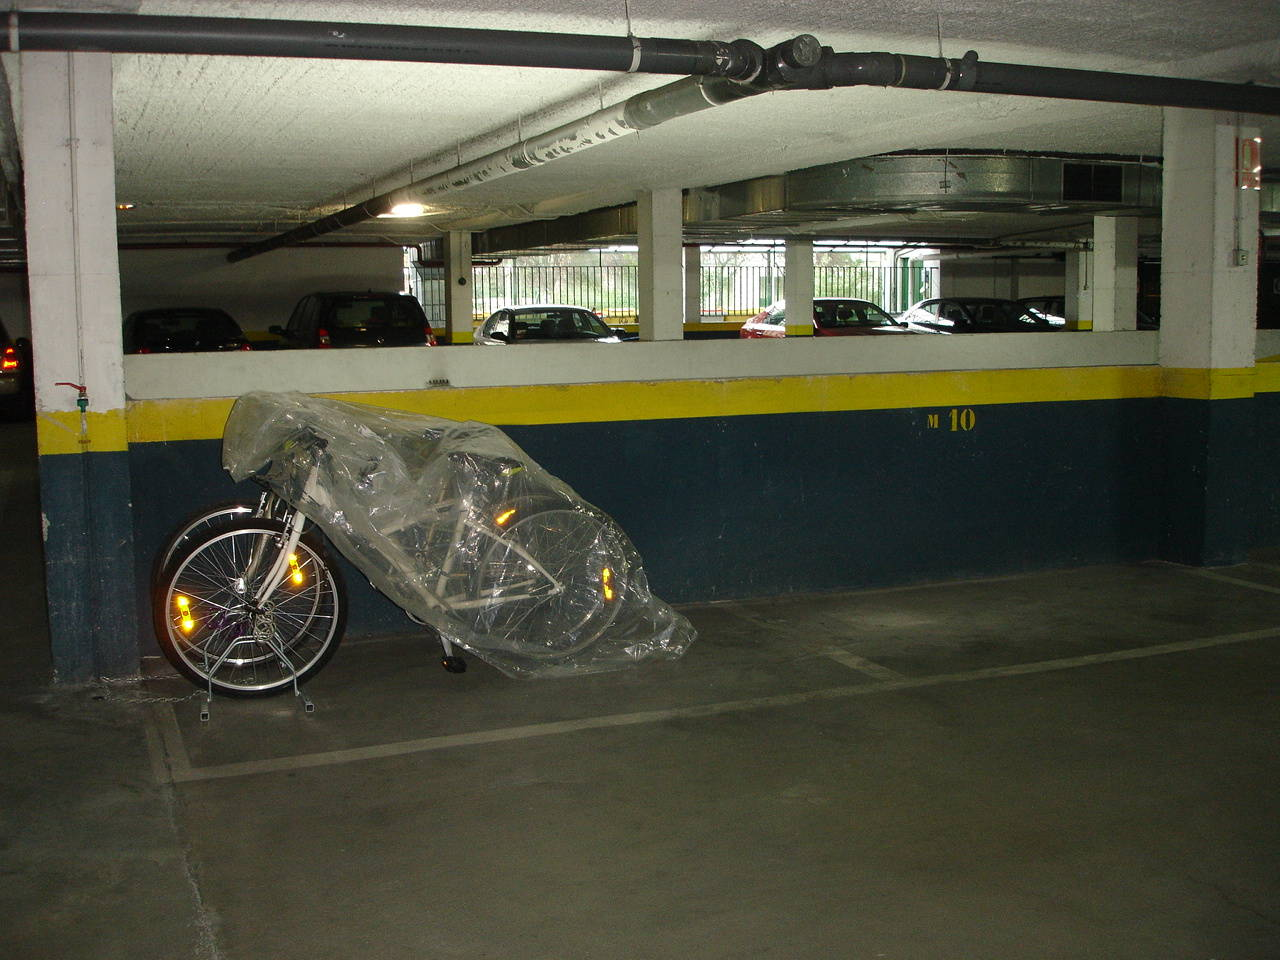 Canillas, de 1 a 4 plazas de garaje para moto grande